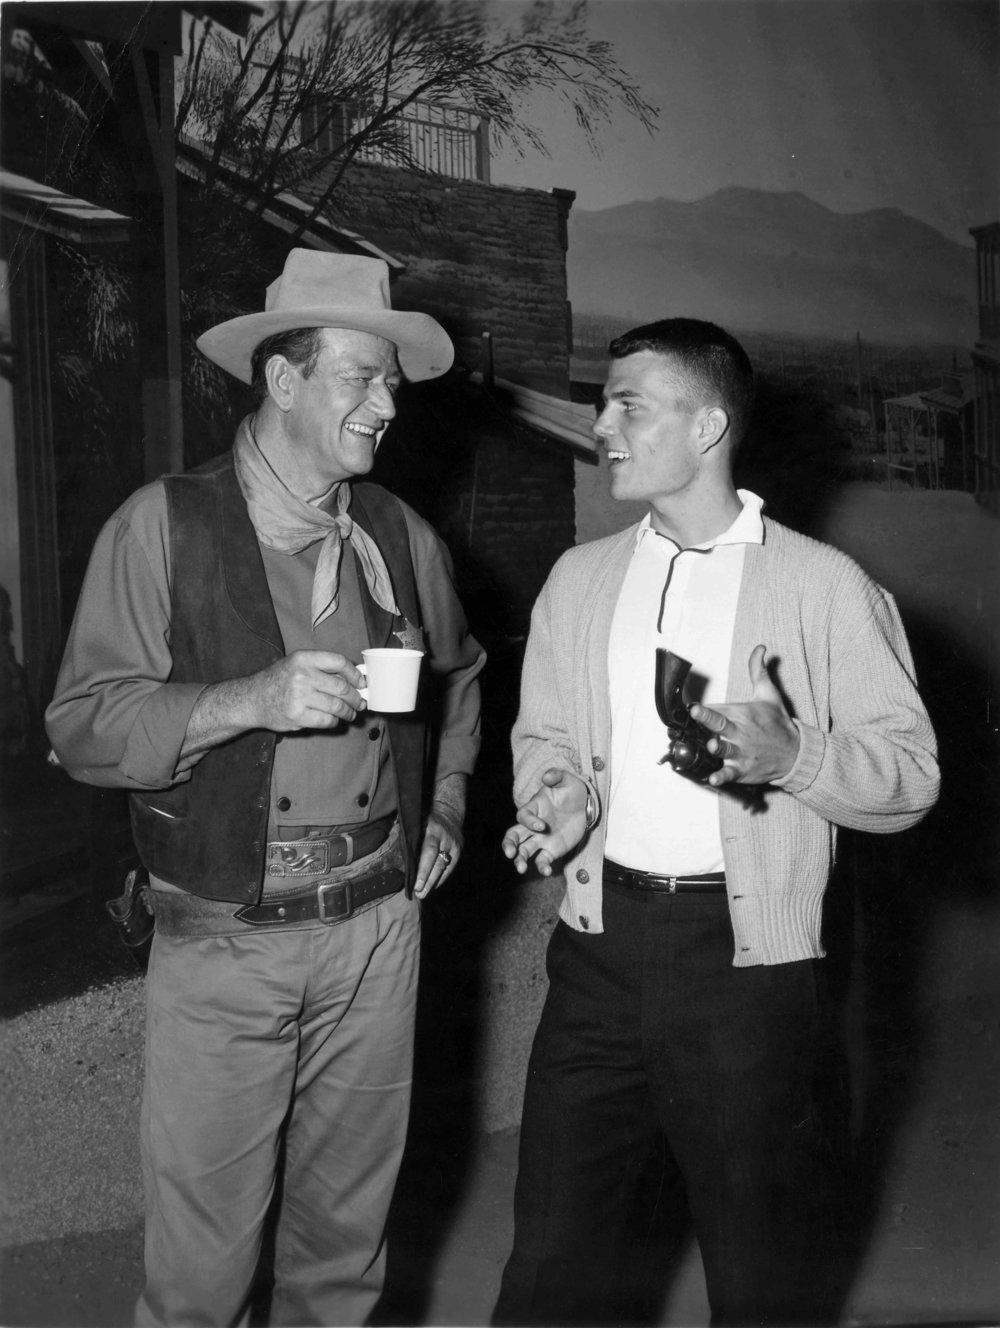 John Wayne (left) and Patrick Wayne (right)